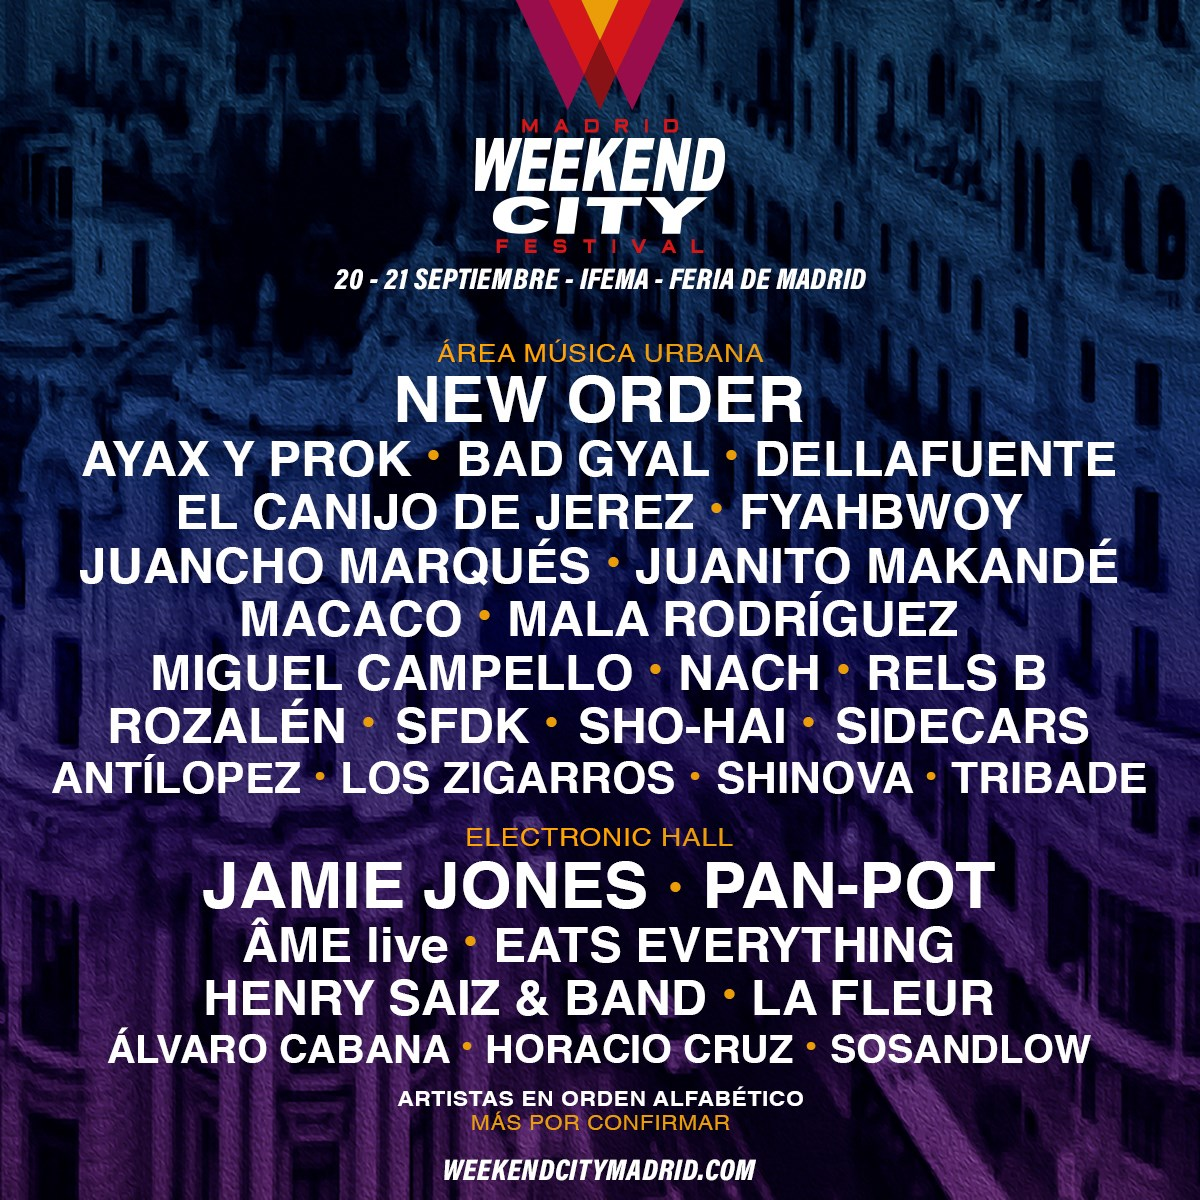 Madrid Weekend City Festival 2019